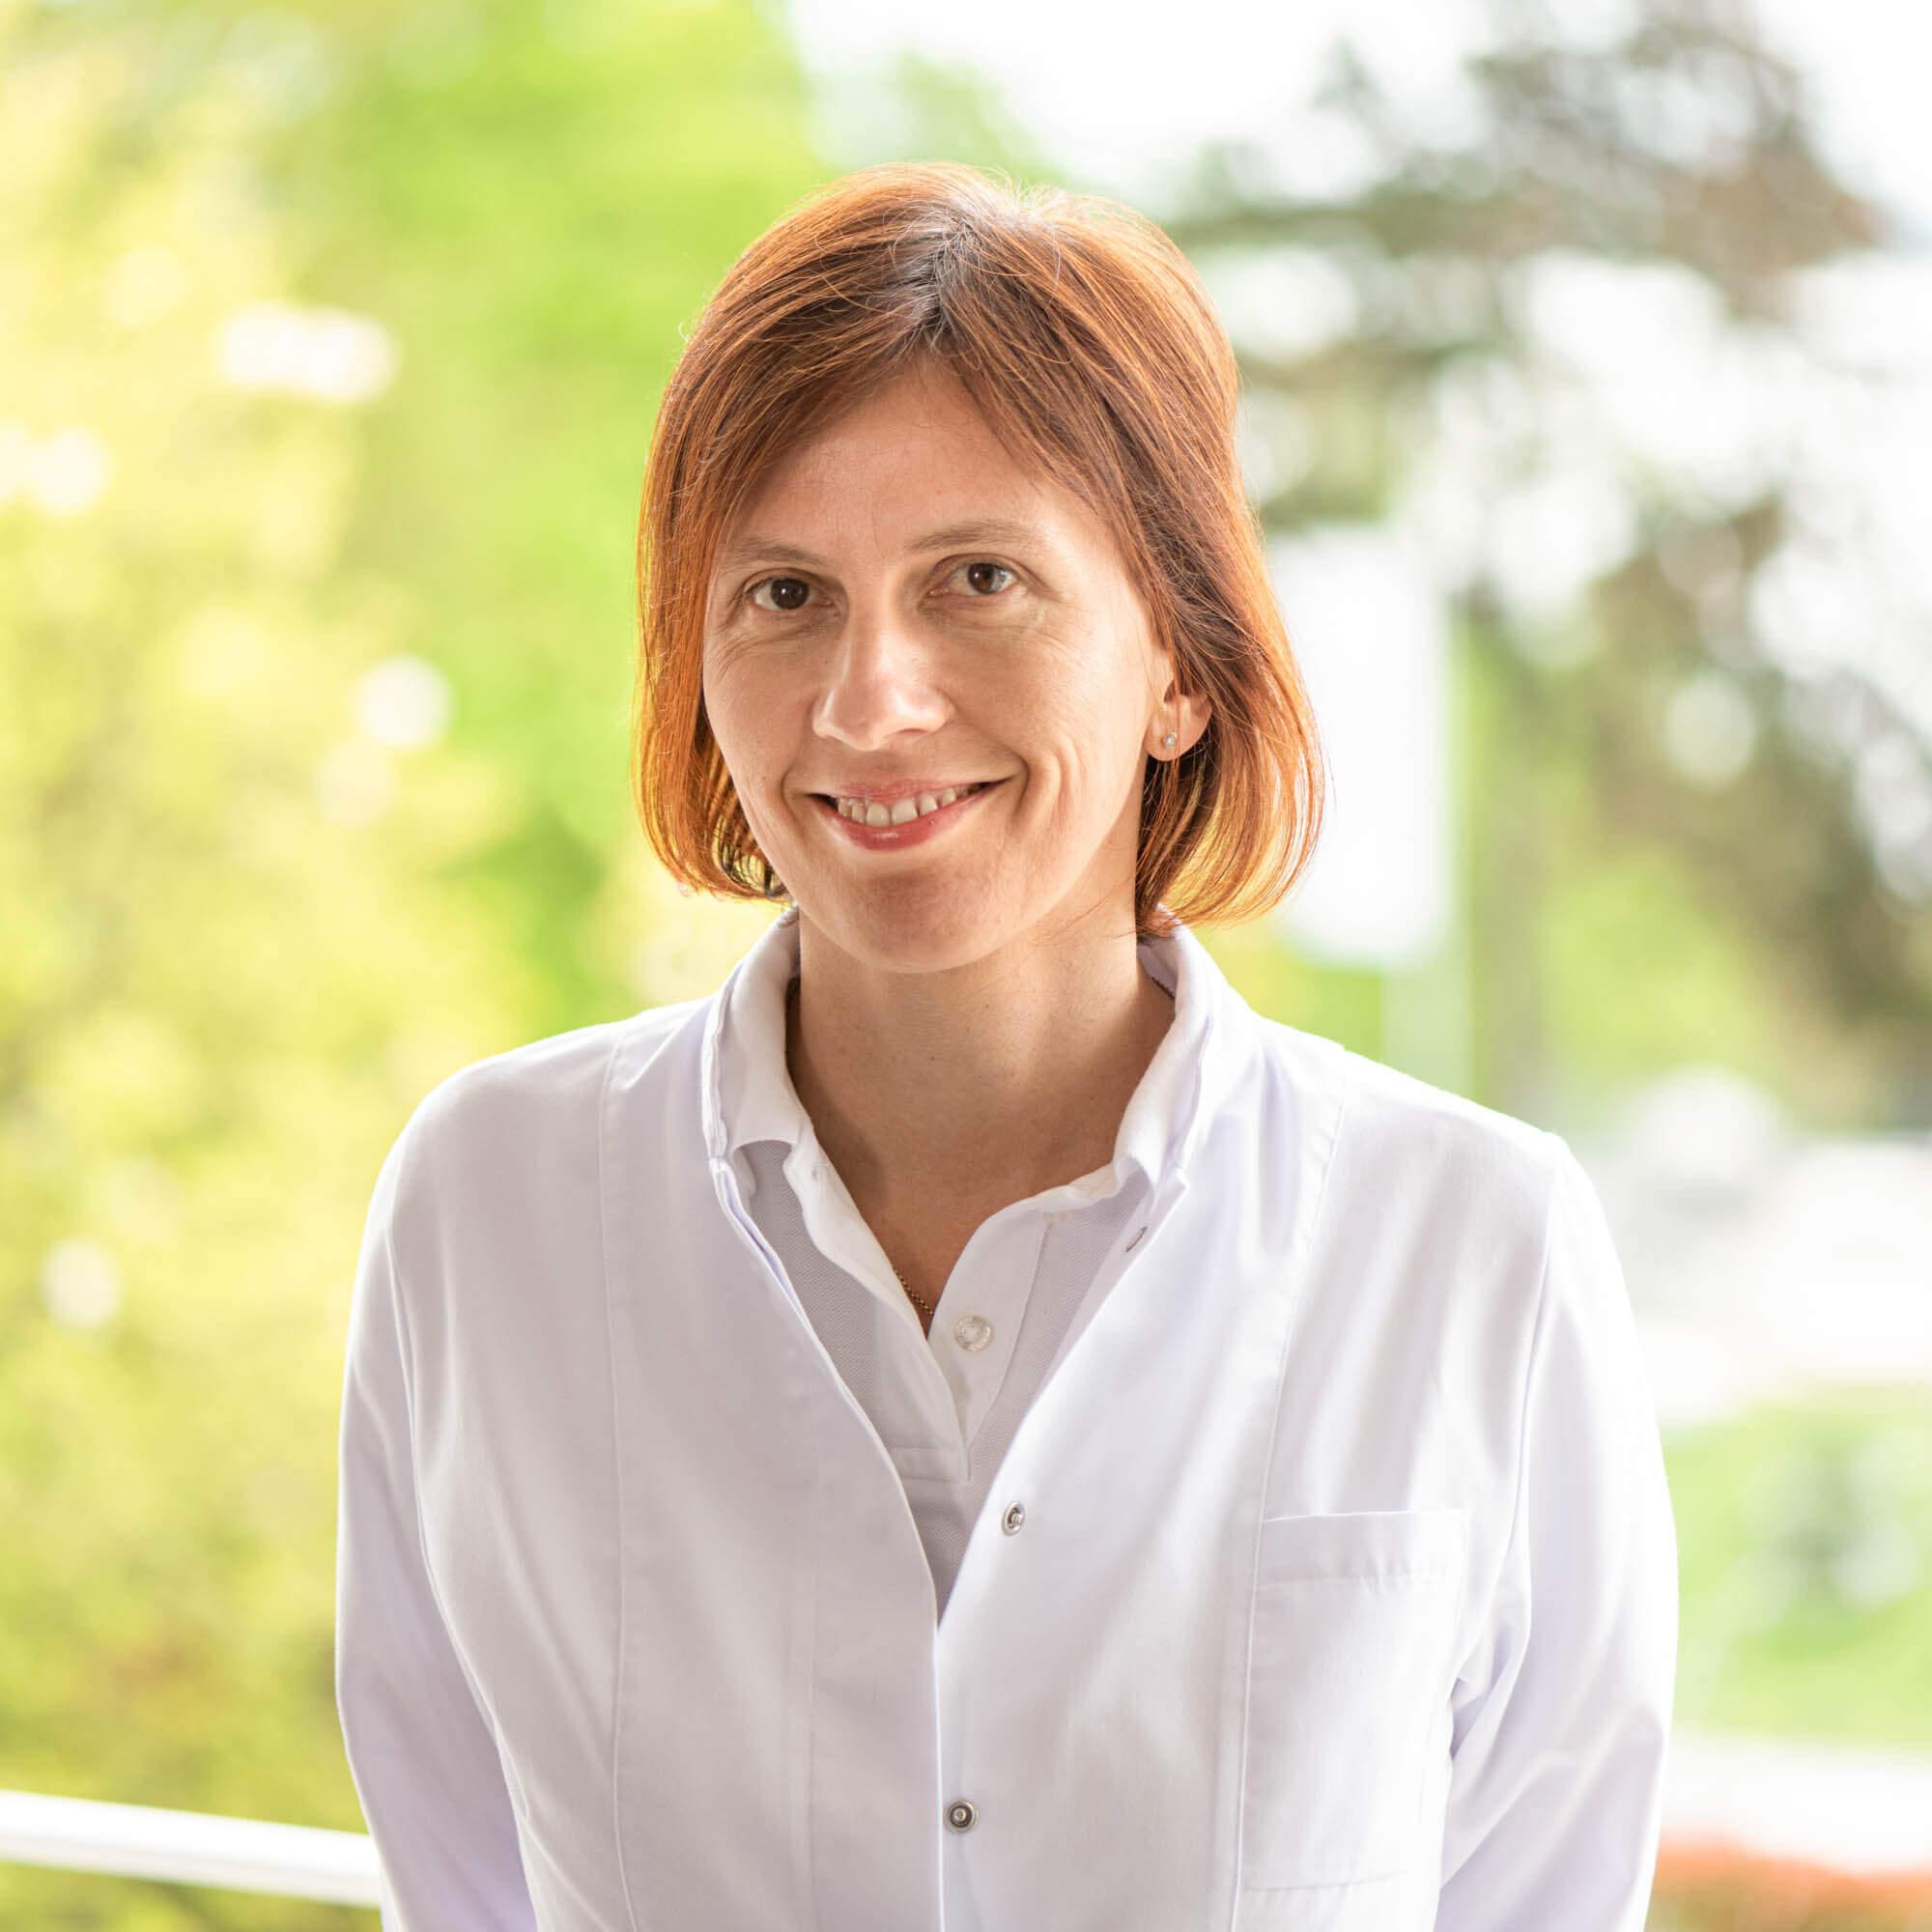 Dra. Sandra van Waegeningh